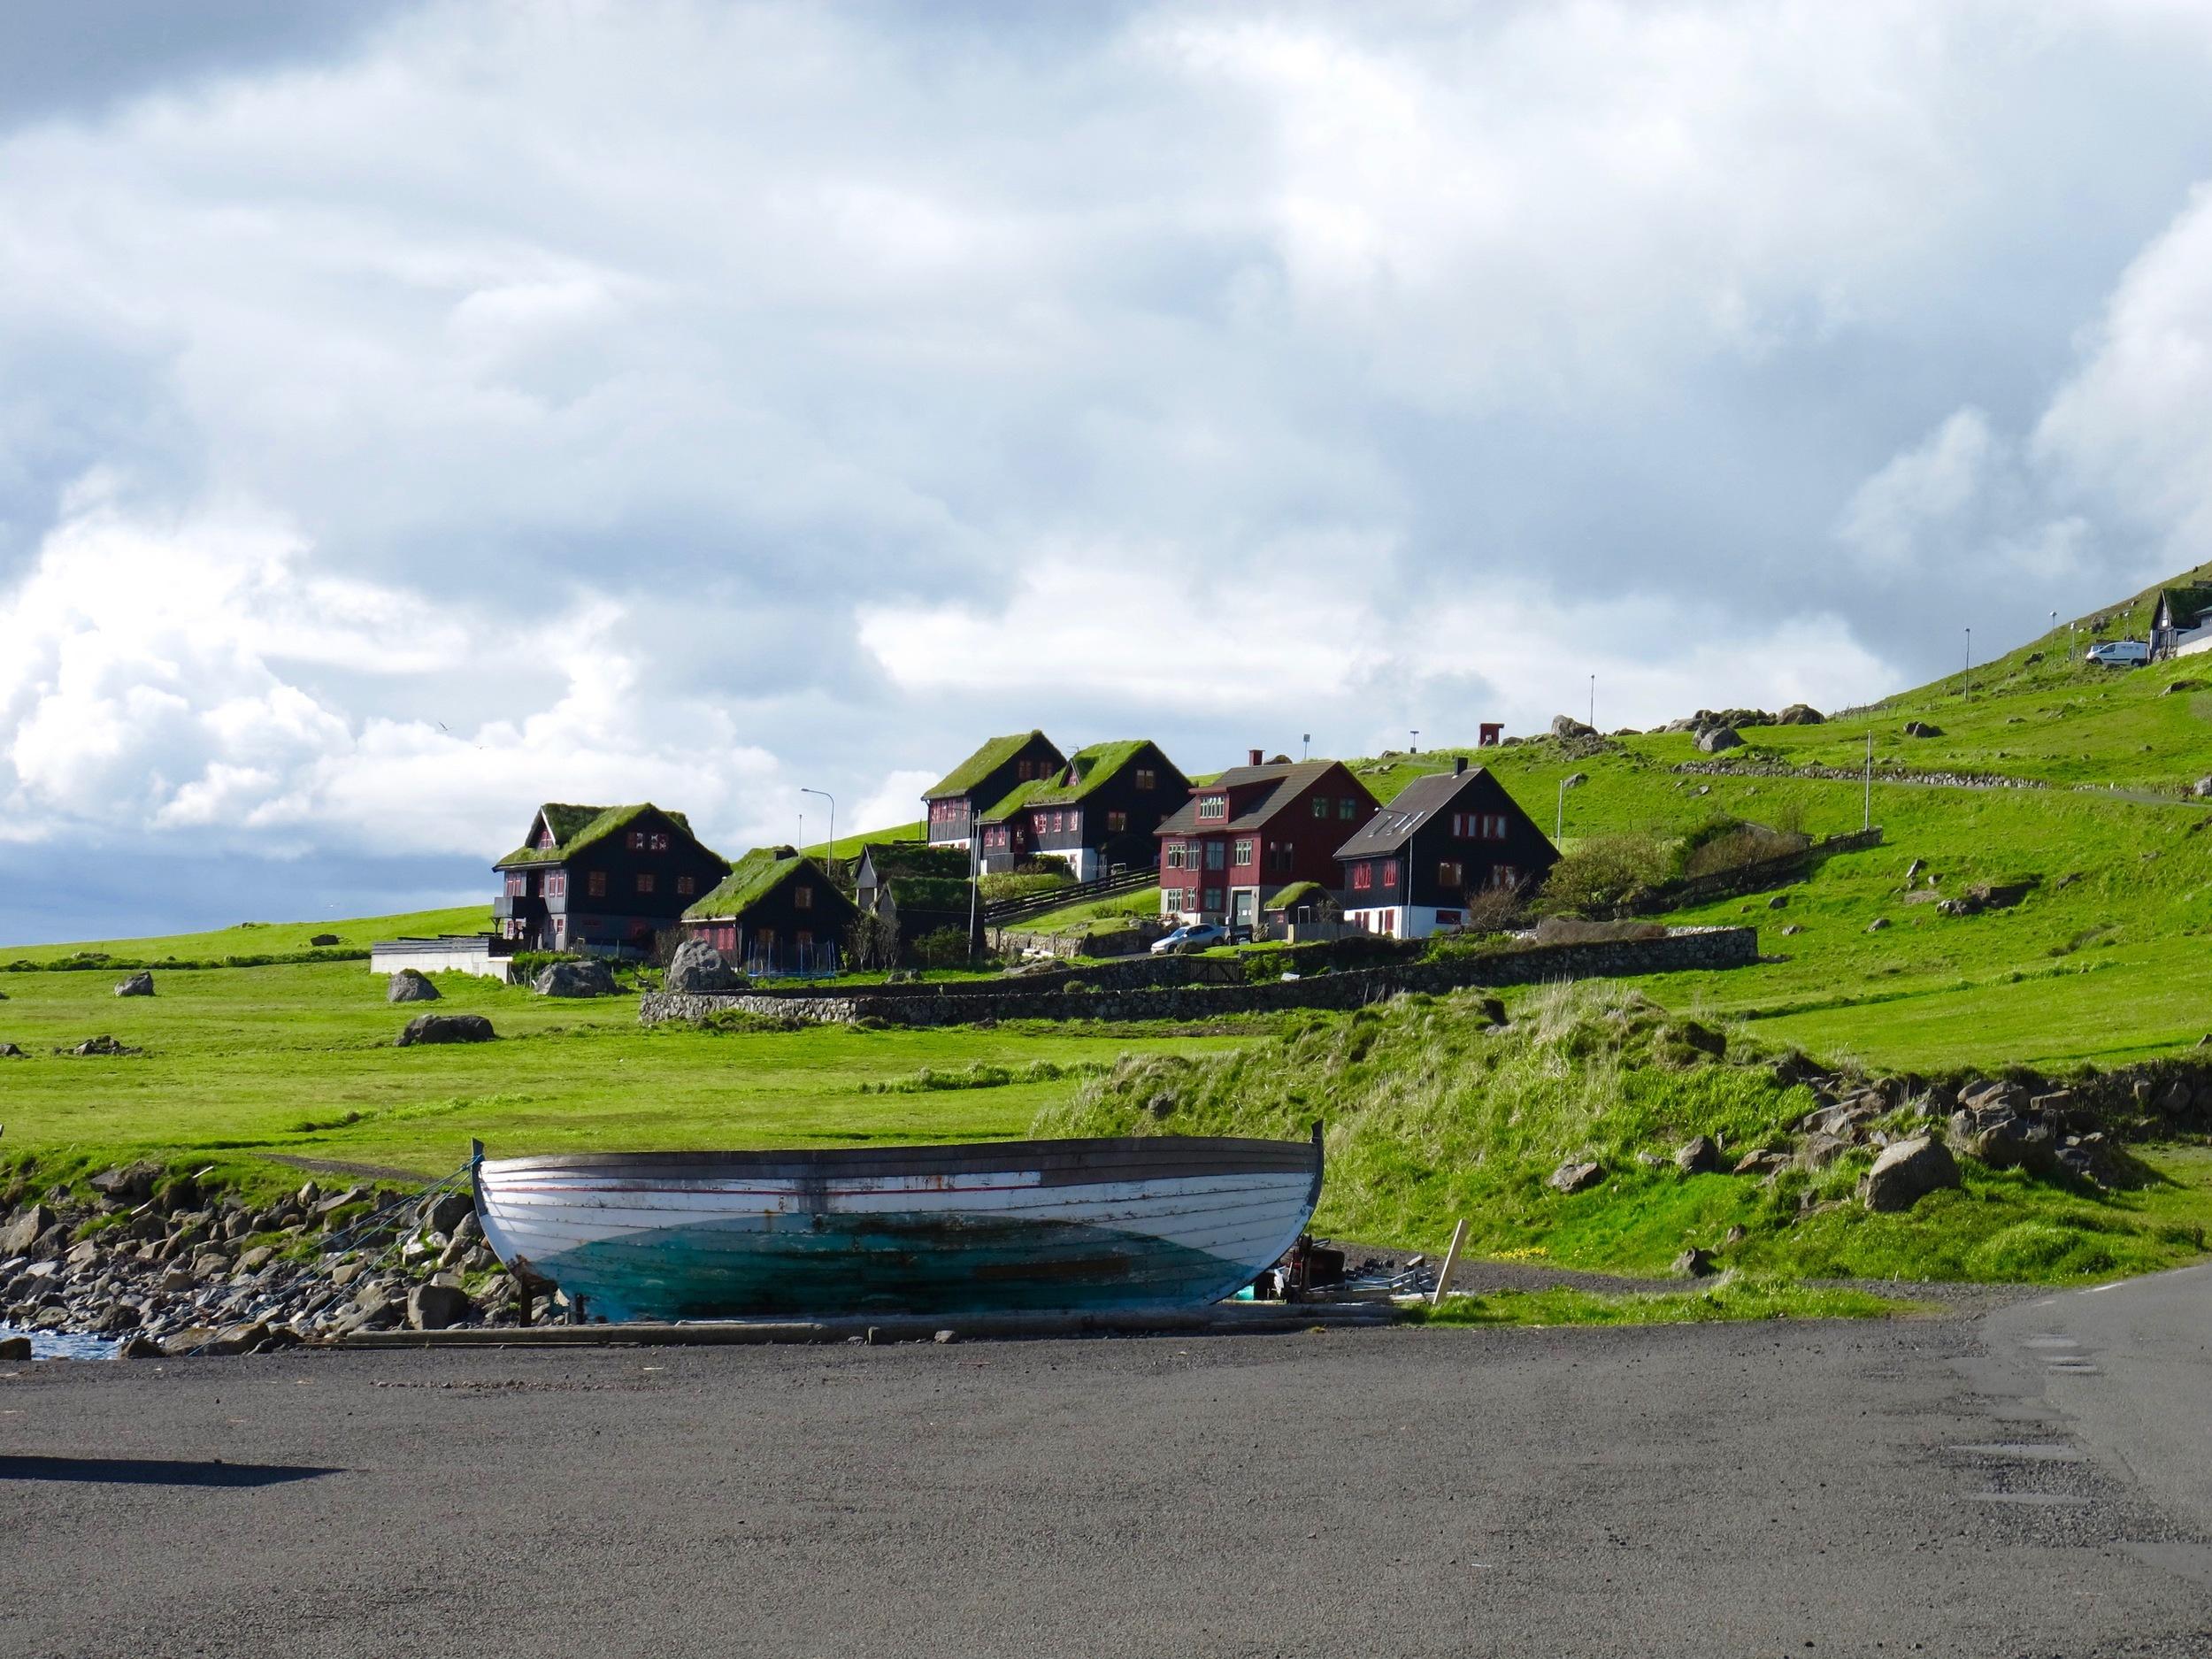 Scenery at Kirkjubøur. Restaurant KOKS will be based in the village